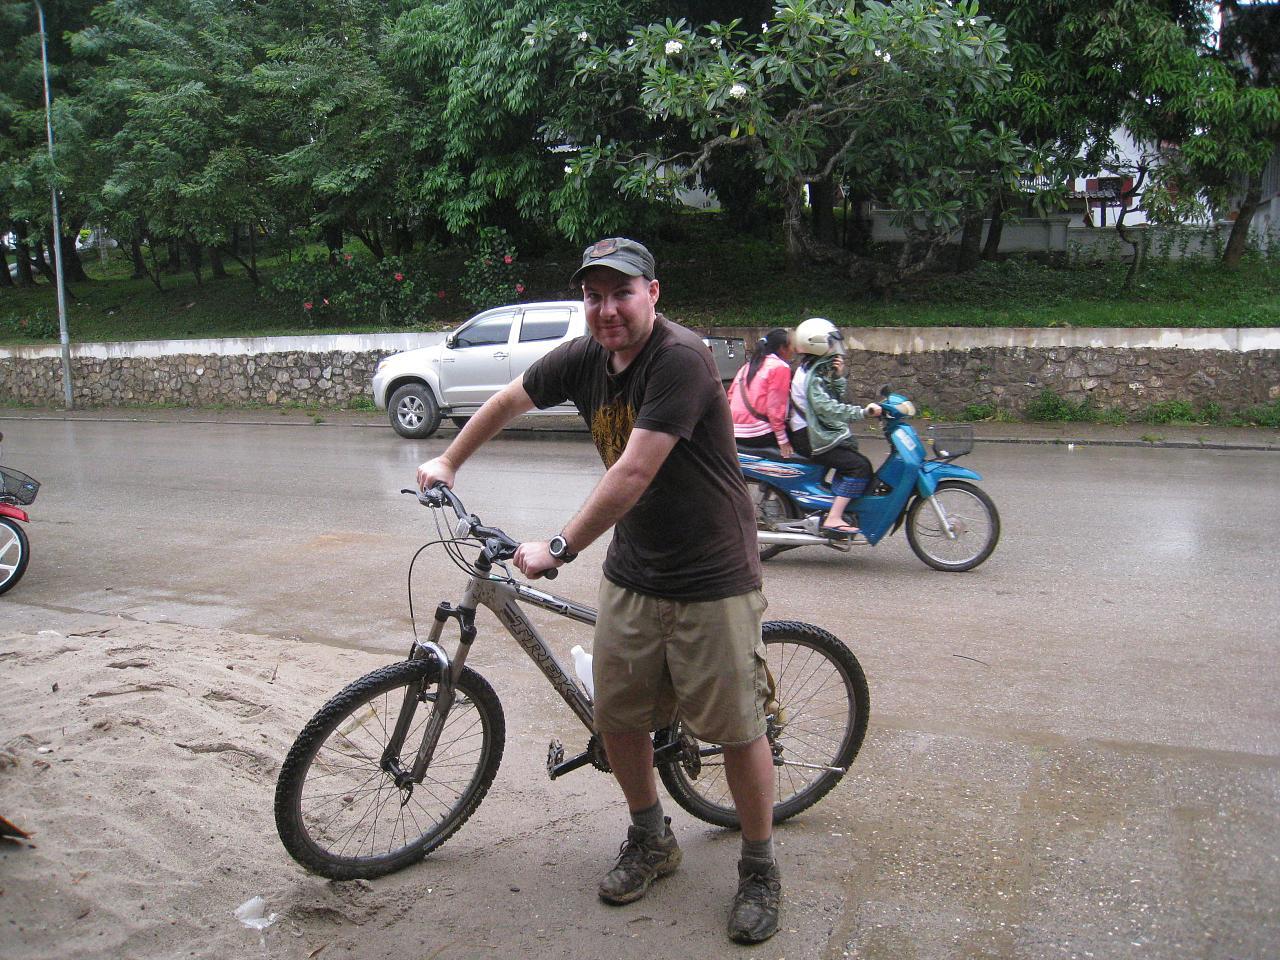 Soaking wet and saddle sore back in Luang Prabang